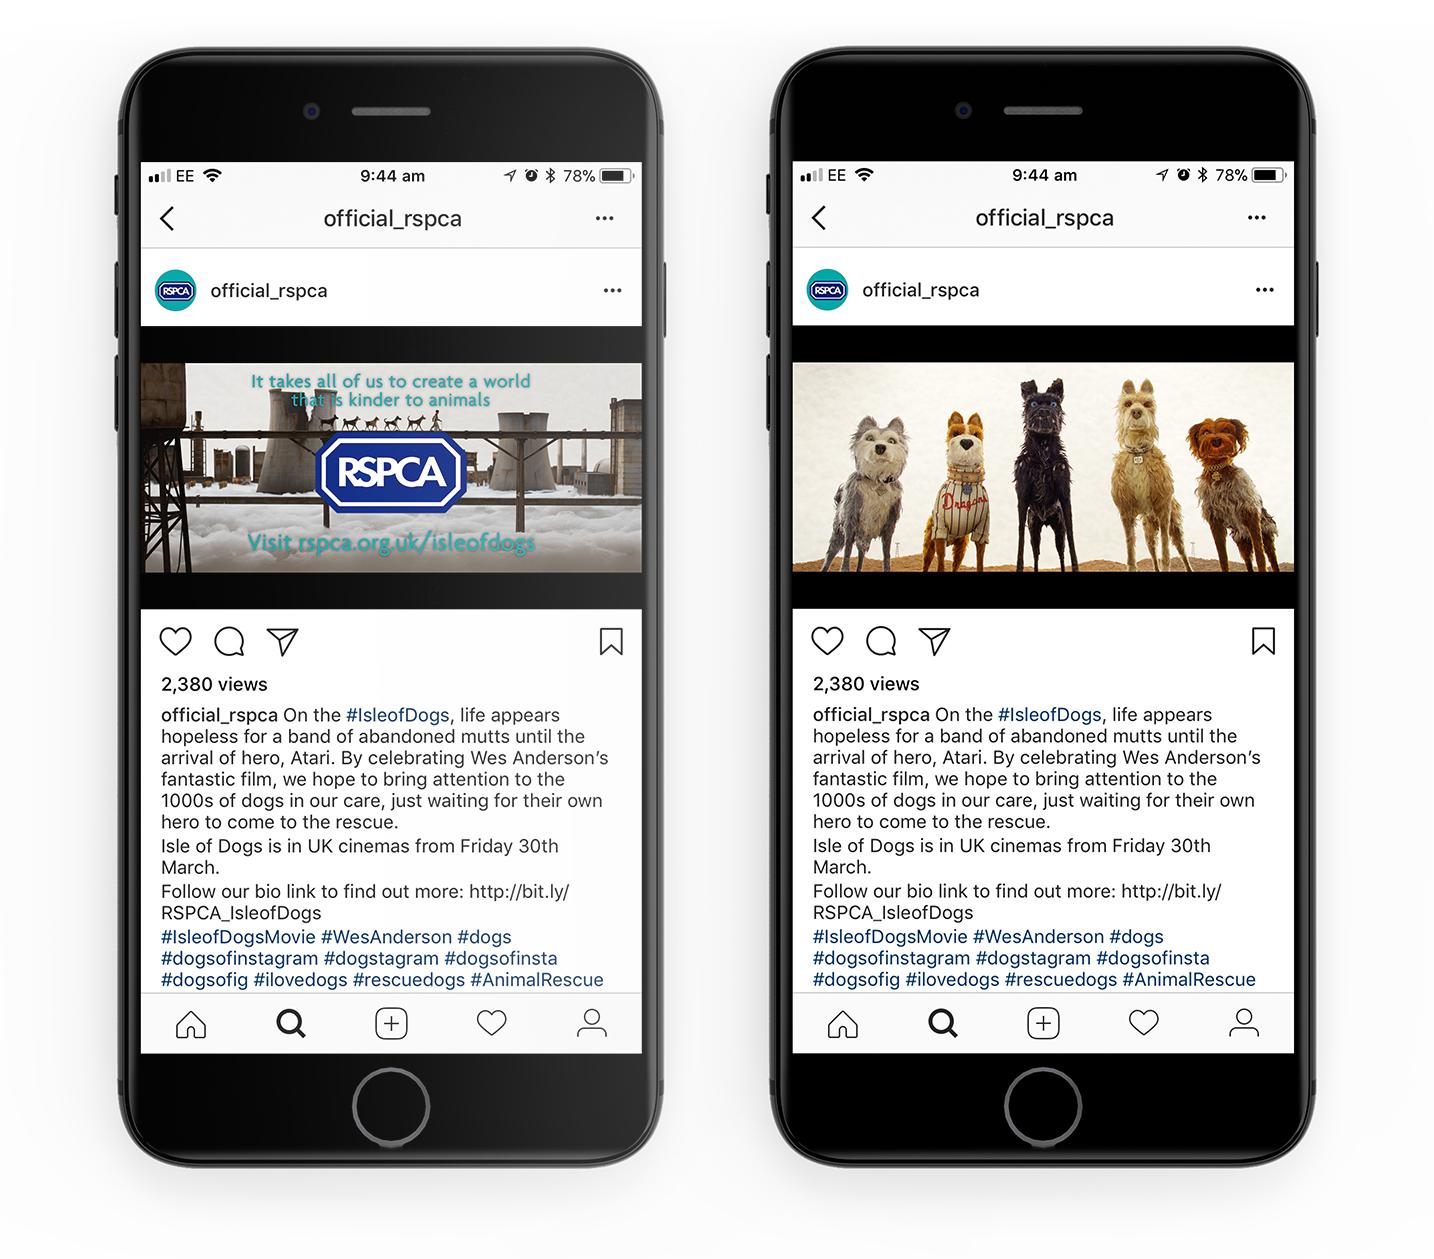 20th Century Fox Film Partnership Isle of Dogs Promotion Social Media